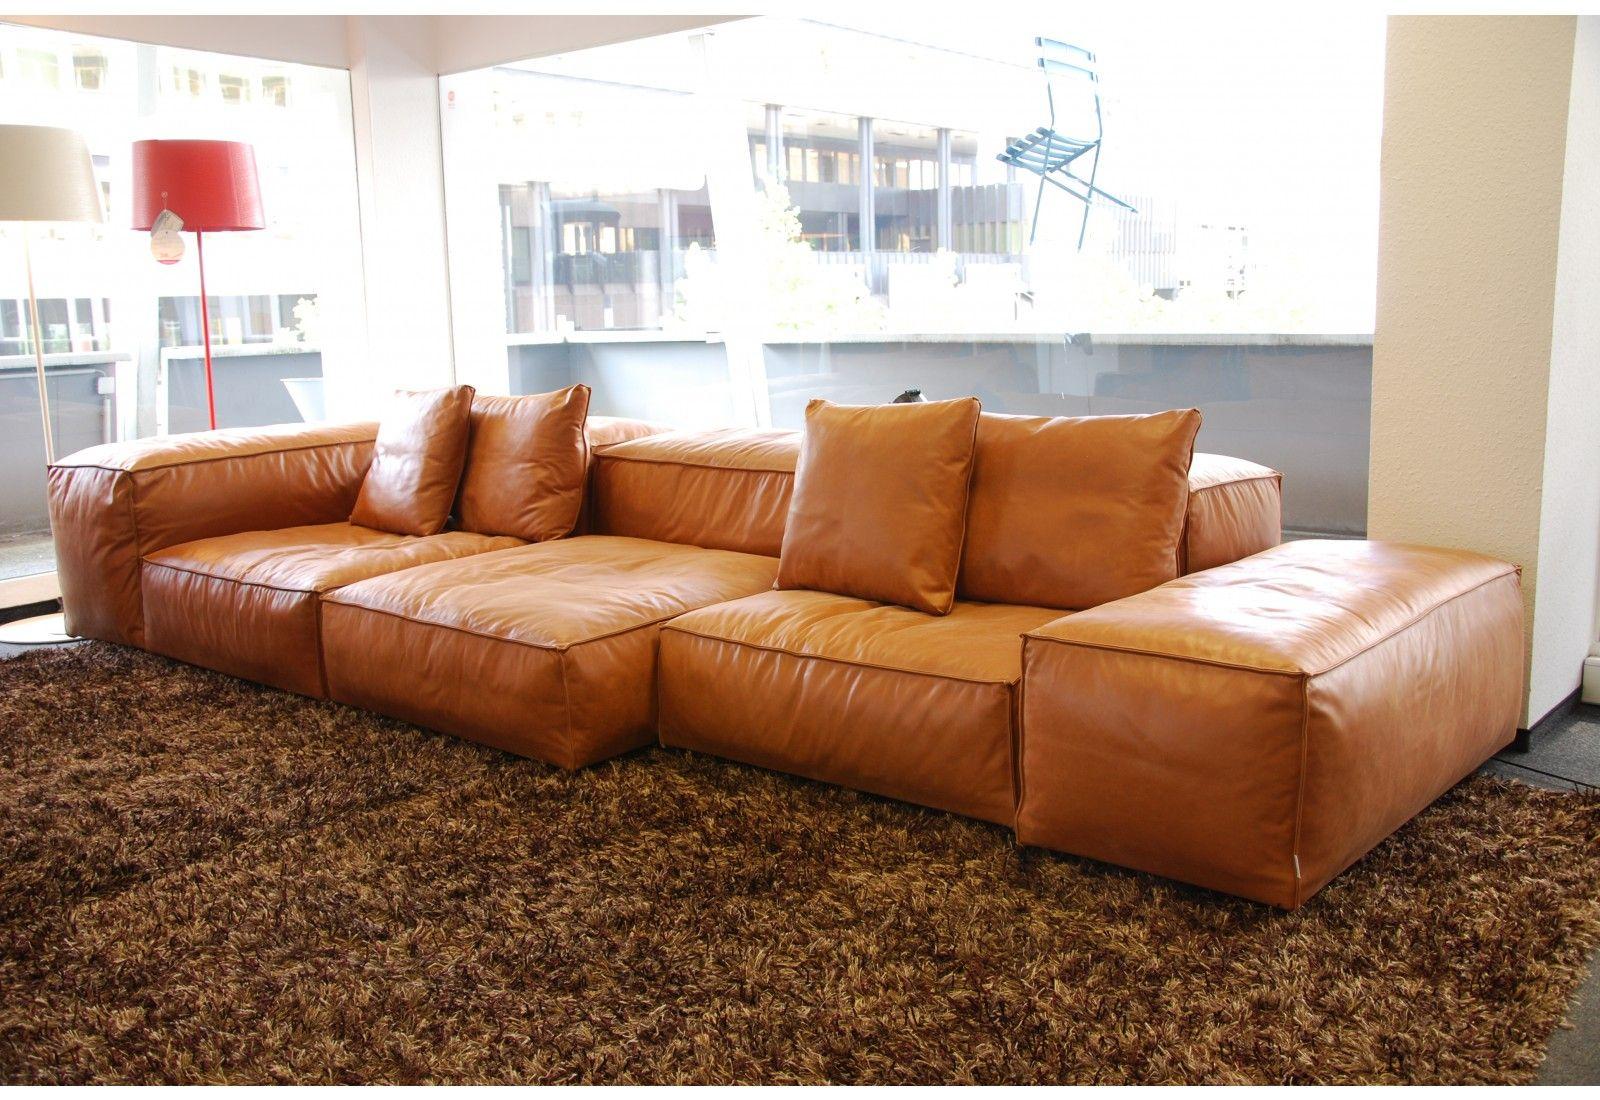 Living Divani Sofa Living Room Sofa Sofa Design Leather